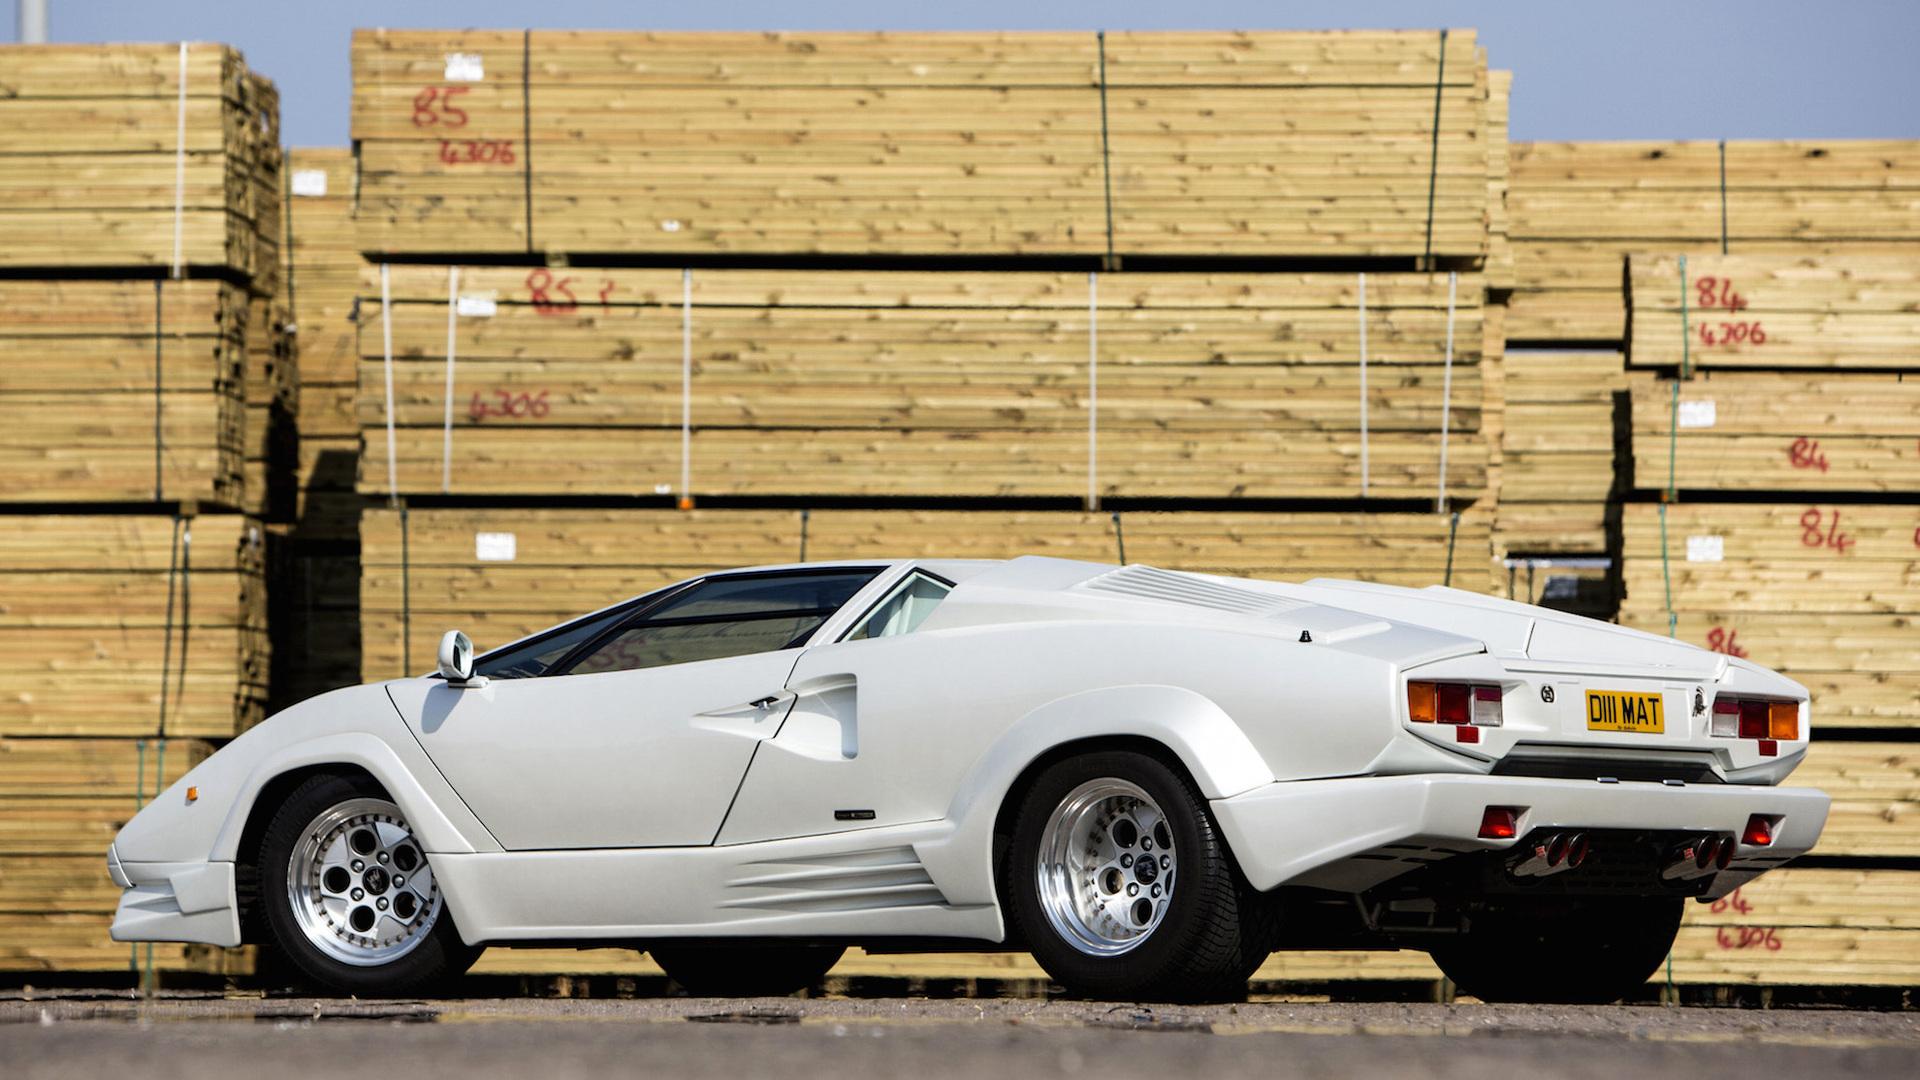 lamborghini-countach-25th-anniversary Exciting Lamborghini Countach Nfs Most Wanted Cars Trend